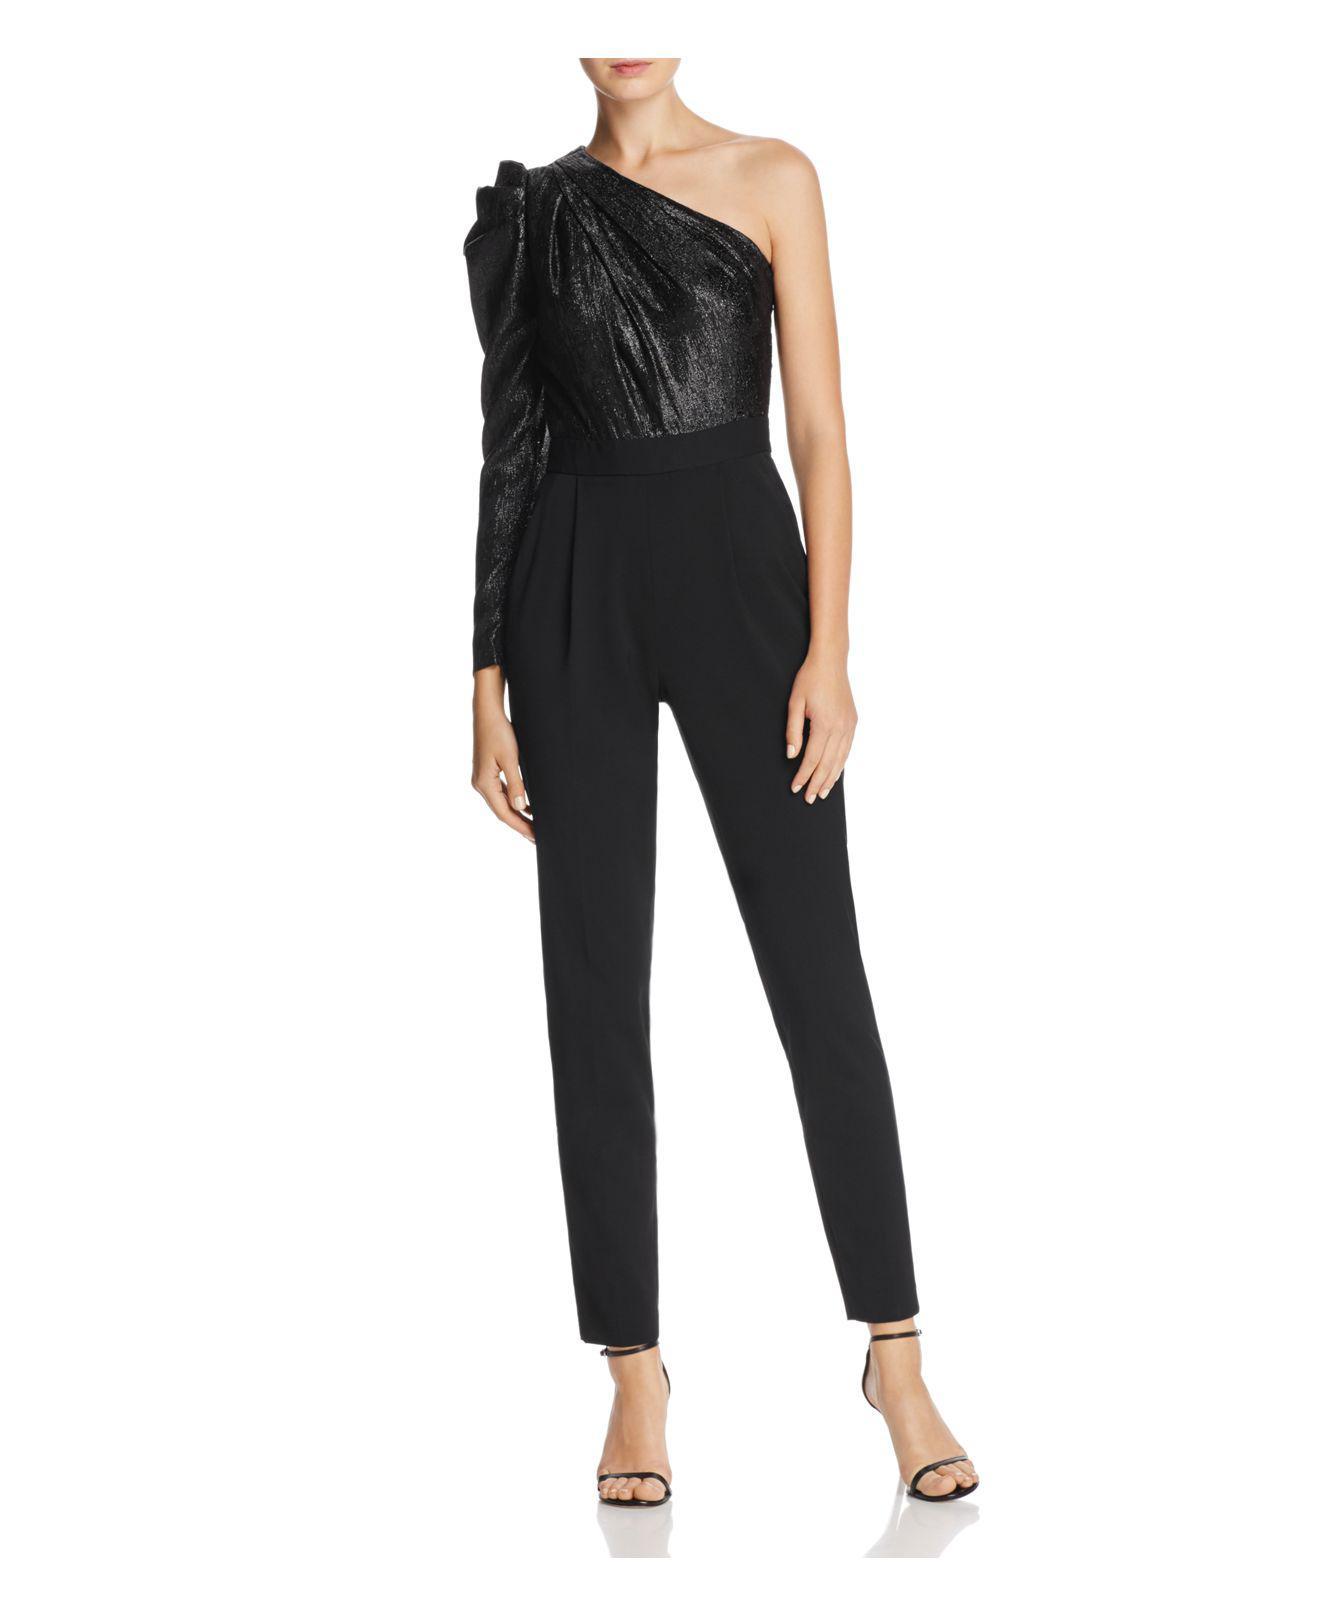 0f6a9e6844db Michael Kors Shine One-shoulder Jumpsuit in Black - Lyst